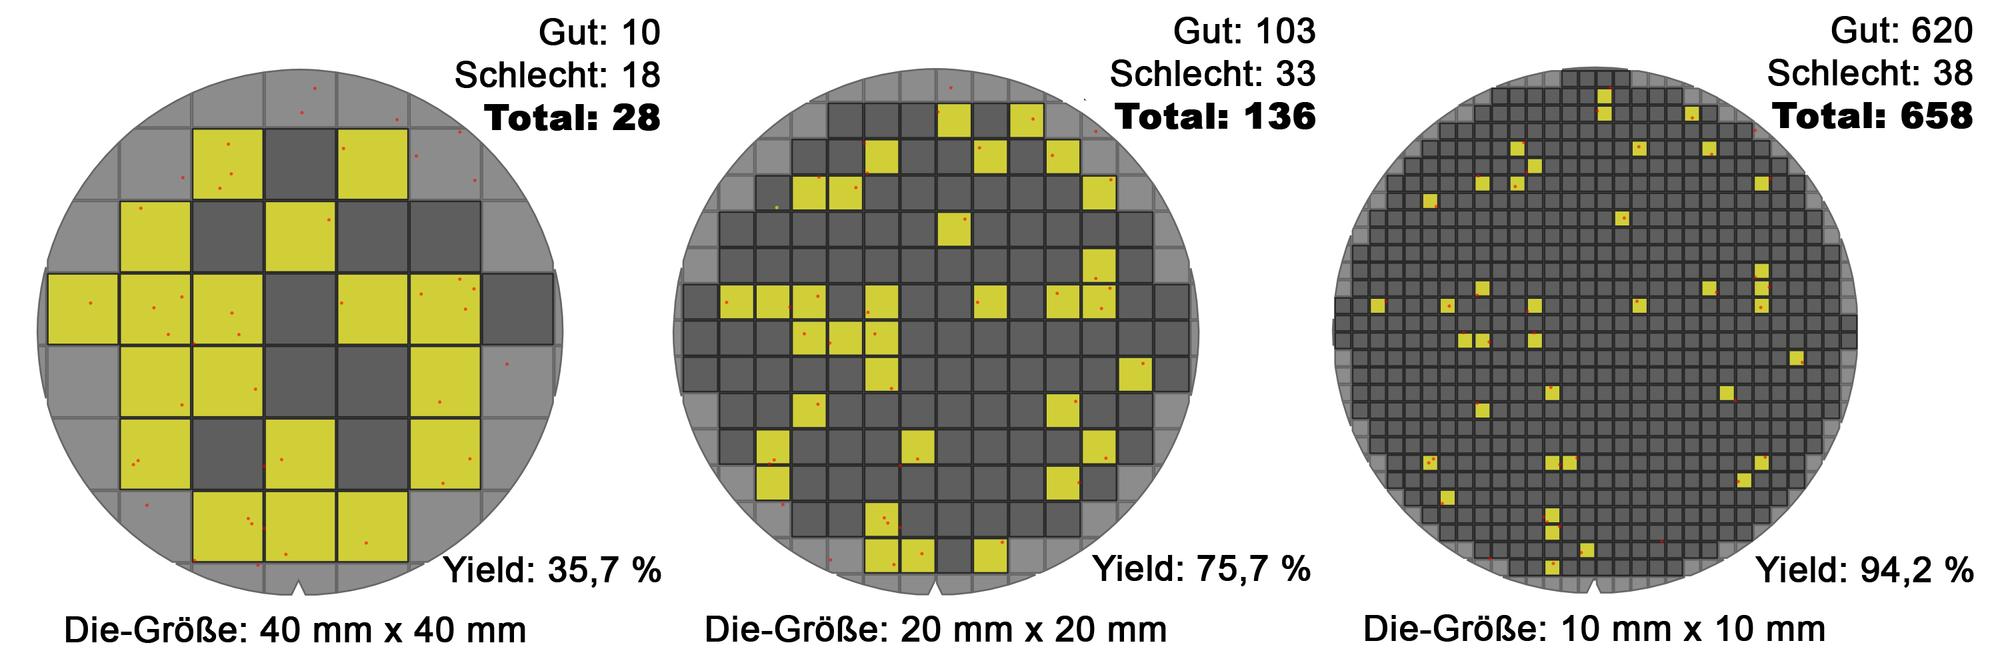 Wafer_die's_yield_model_(10-20-40mm)_-_Version_2_-_DE[1].png